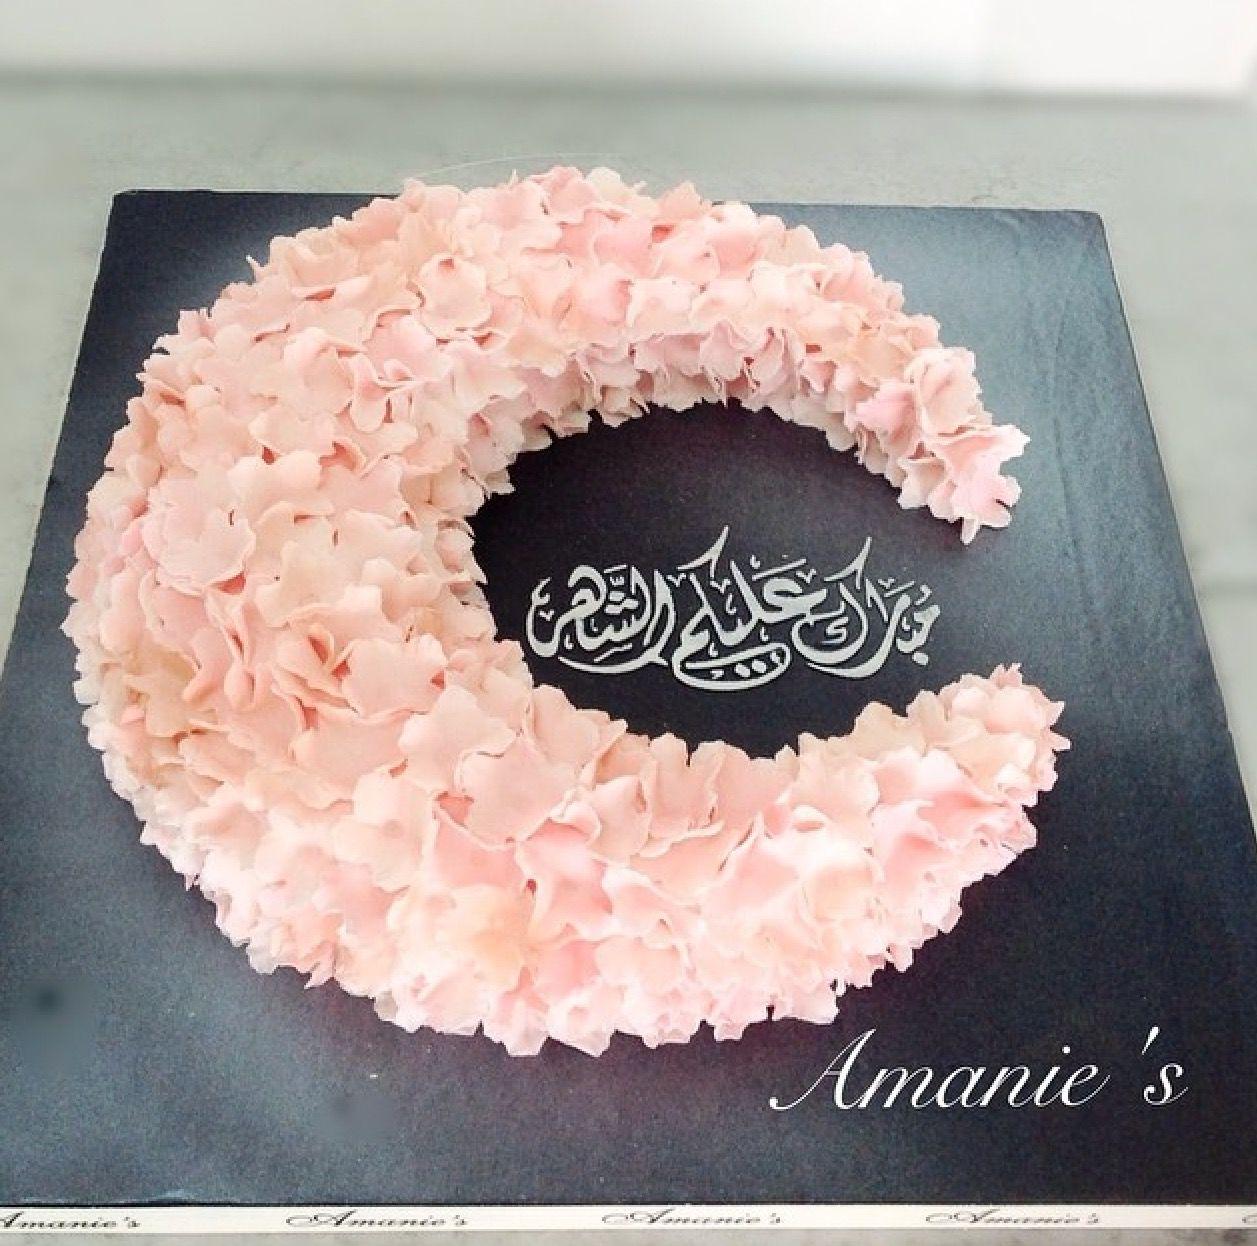 Wedding decorations muslim october 2018 amanies fondant cake moon flowers ramadan  Islamic praying